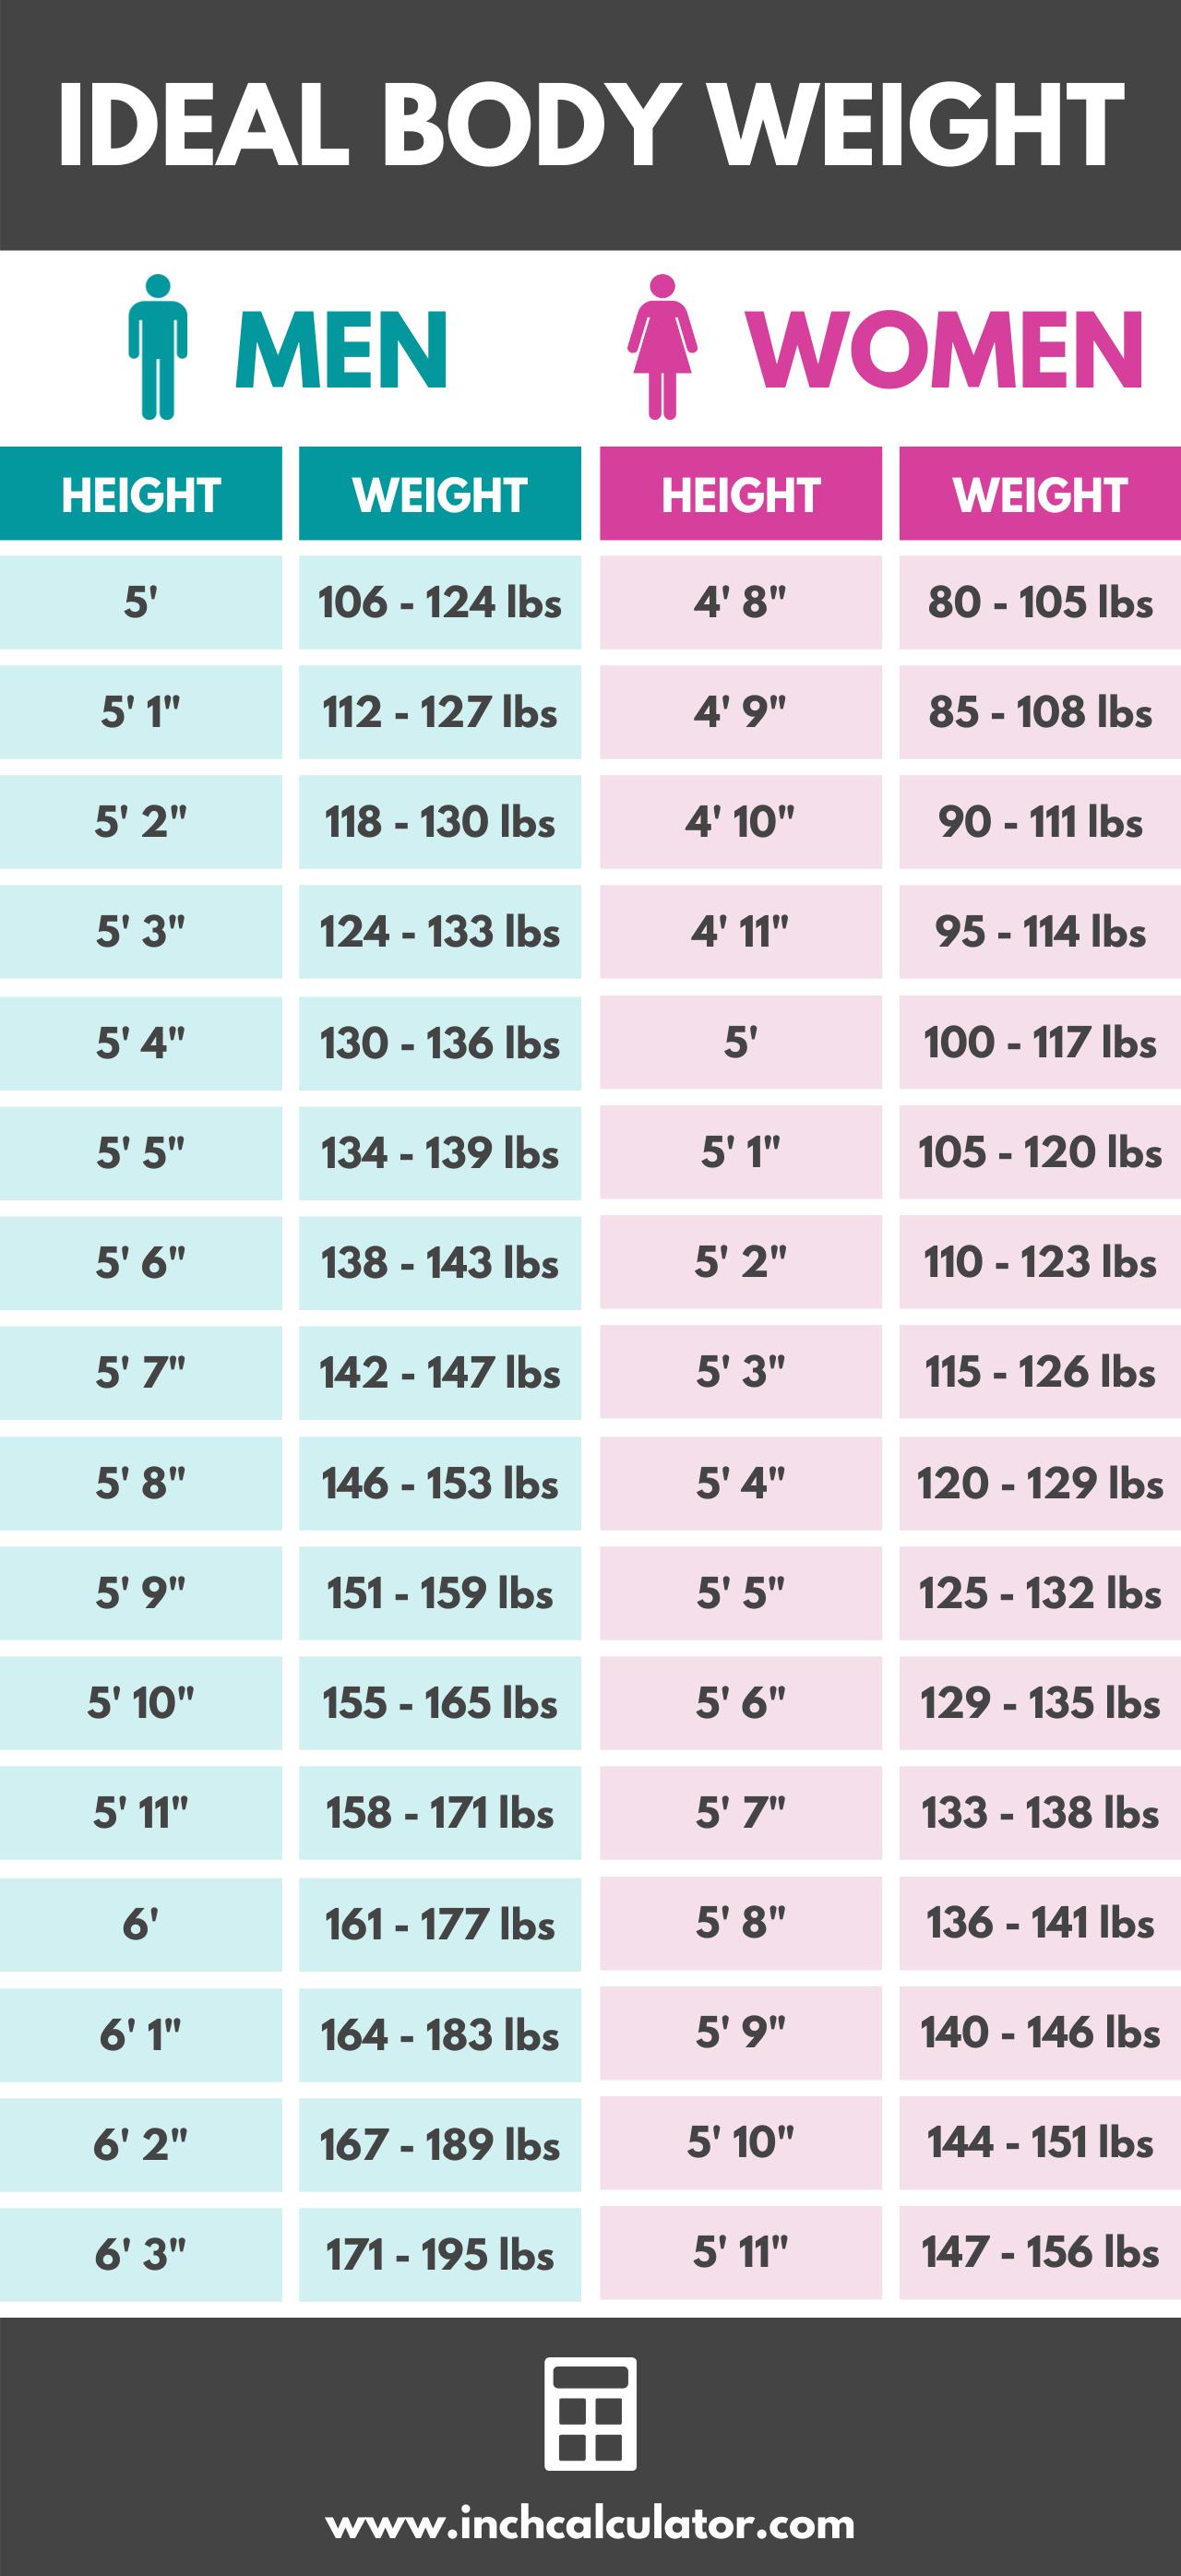 Share ideal body weight calculator